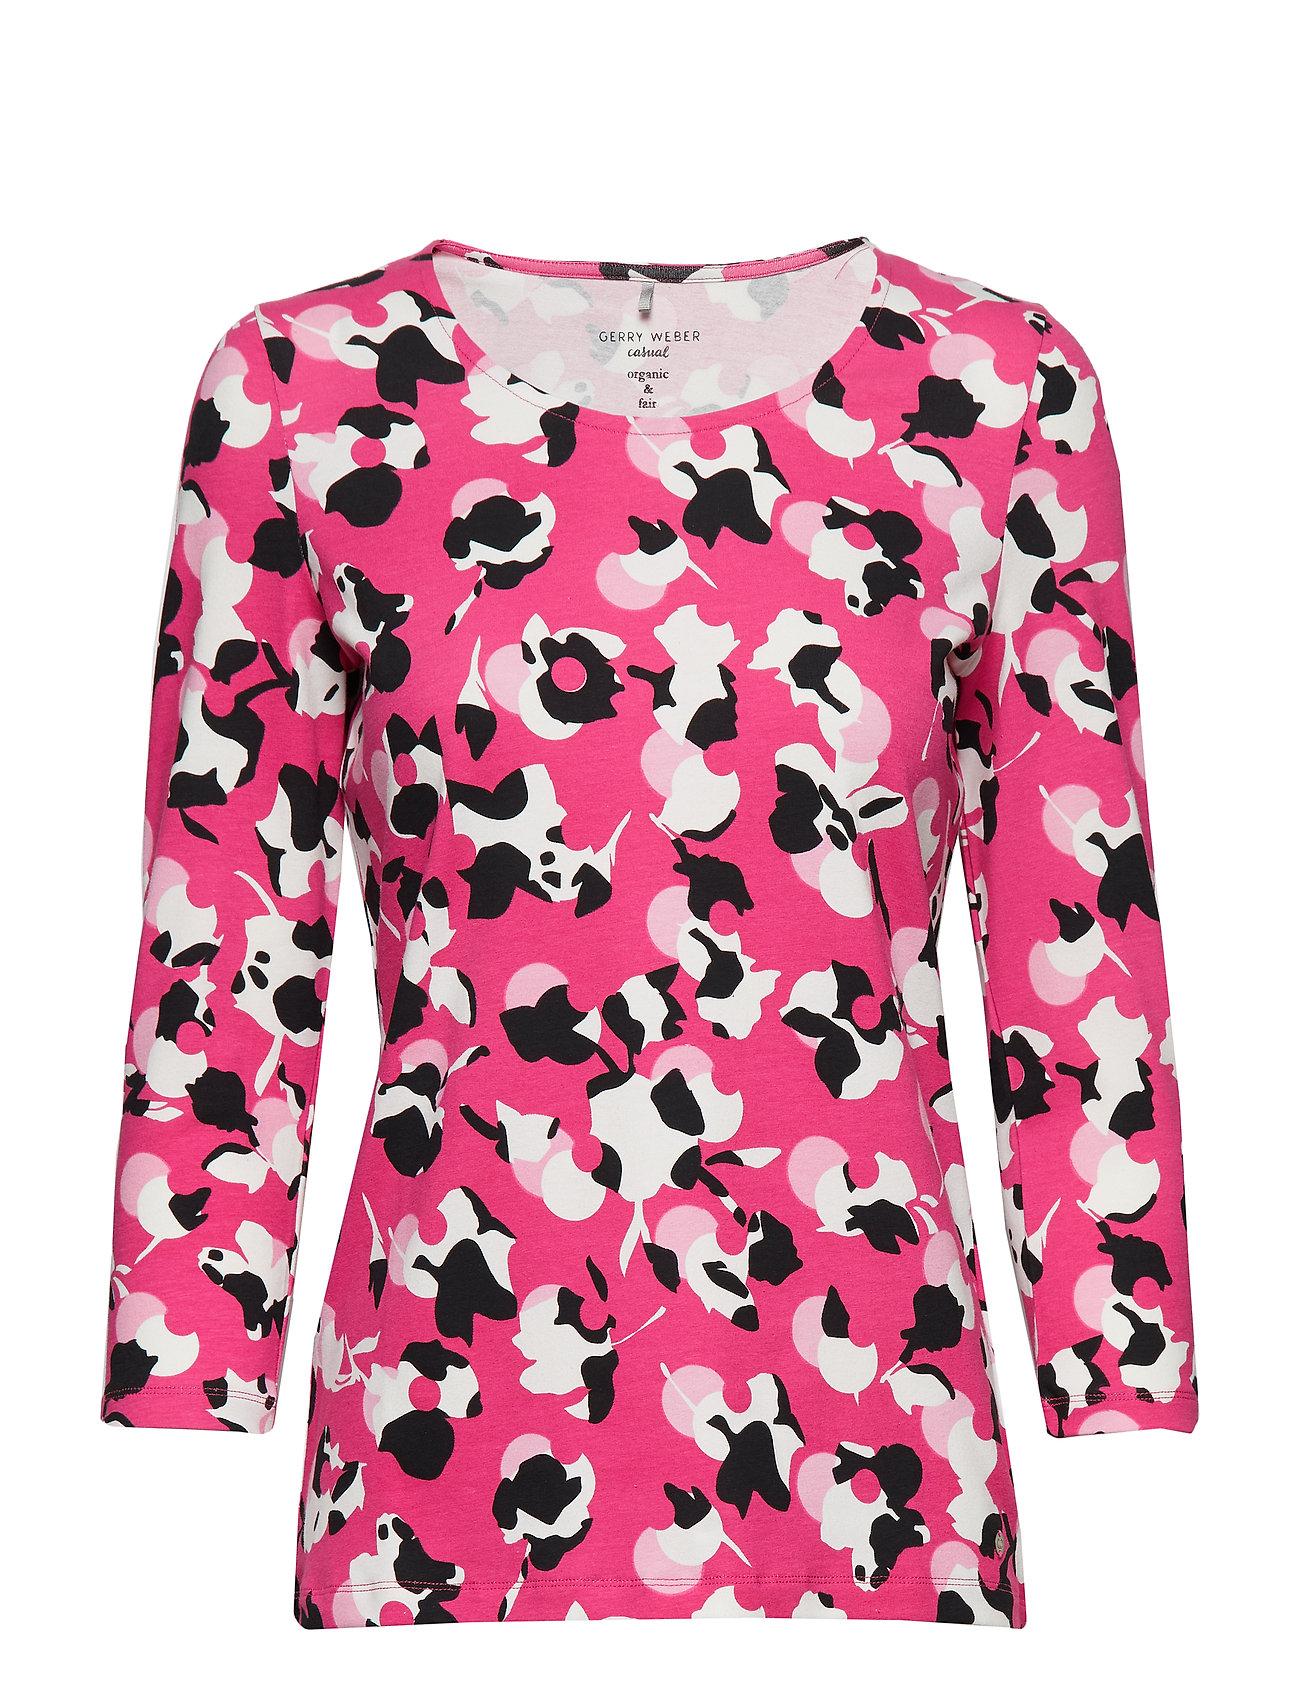 Image of T-Shirt 3/4-Sleeve R Langærmet T-shirt Lyserød GERRY WEBER EDITION (3090827599)